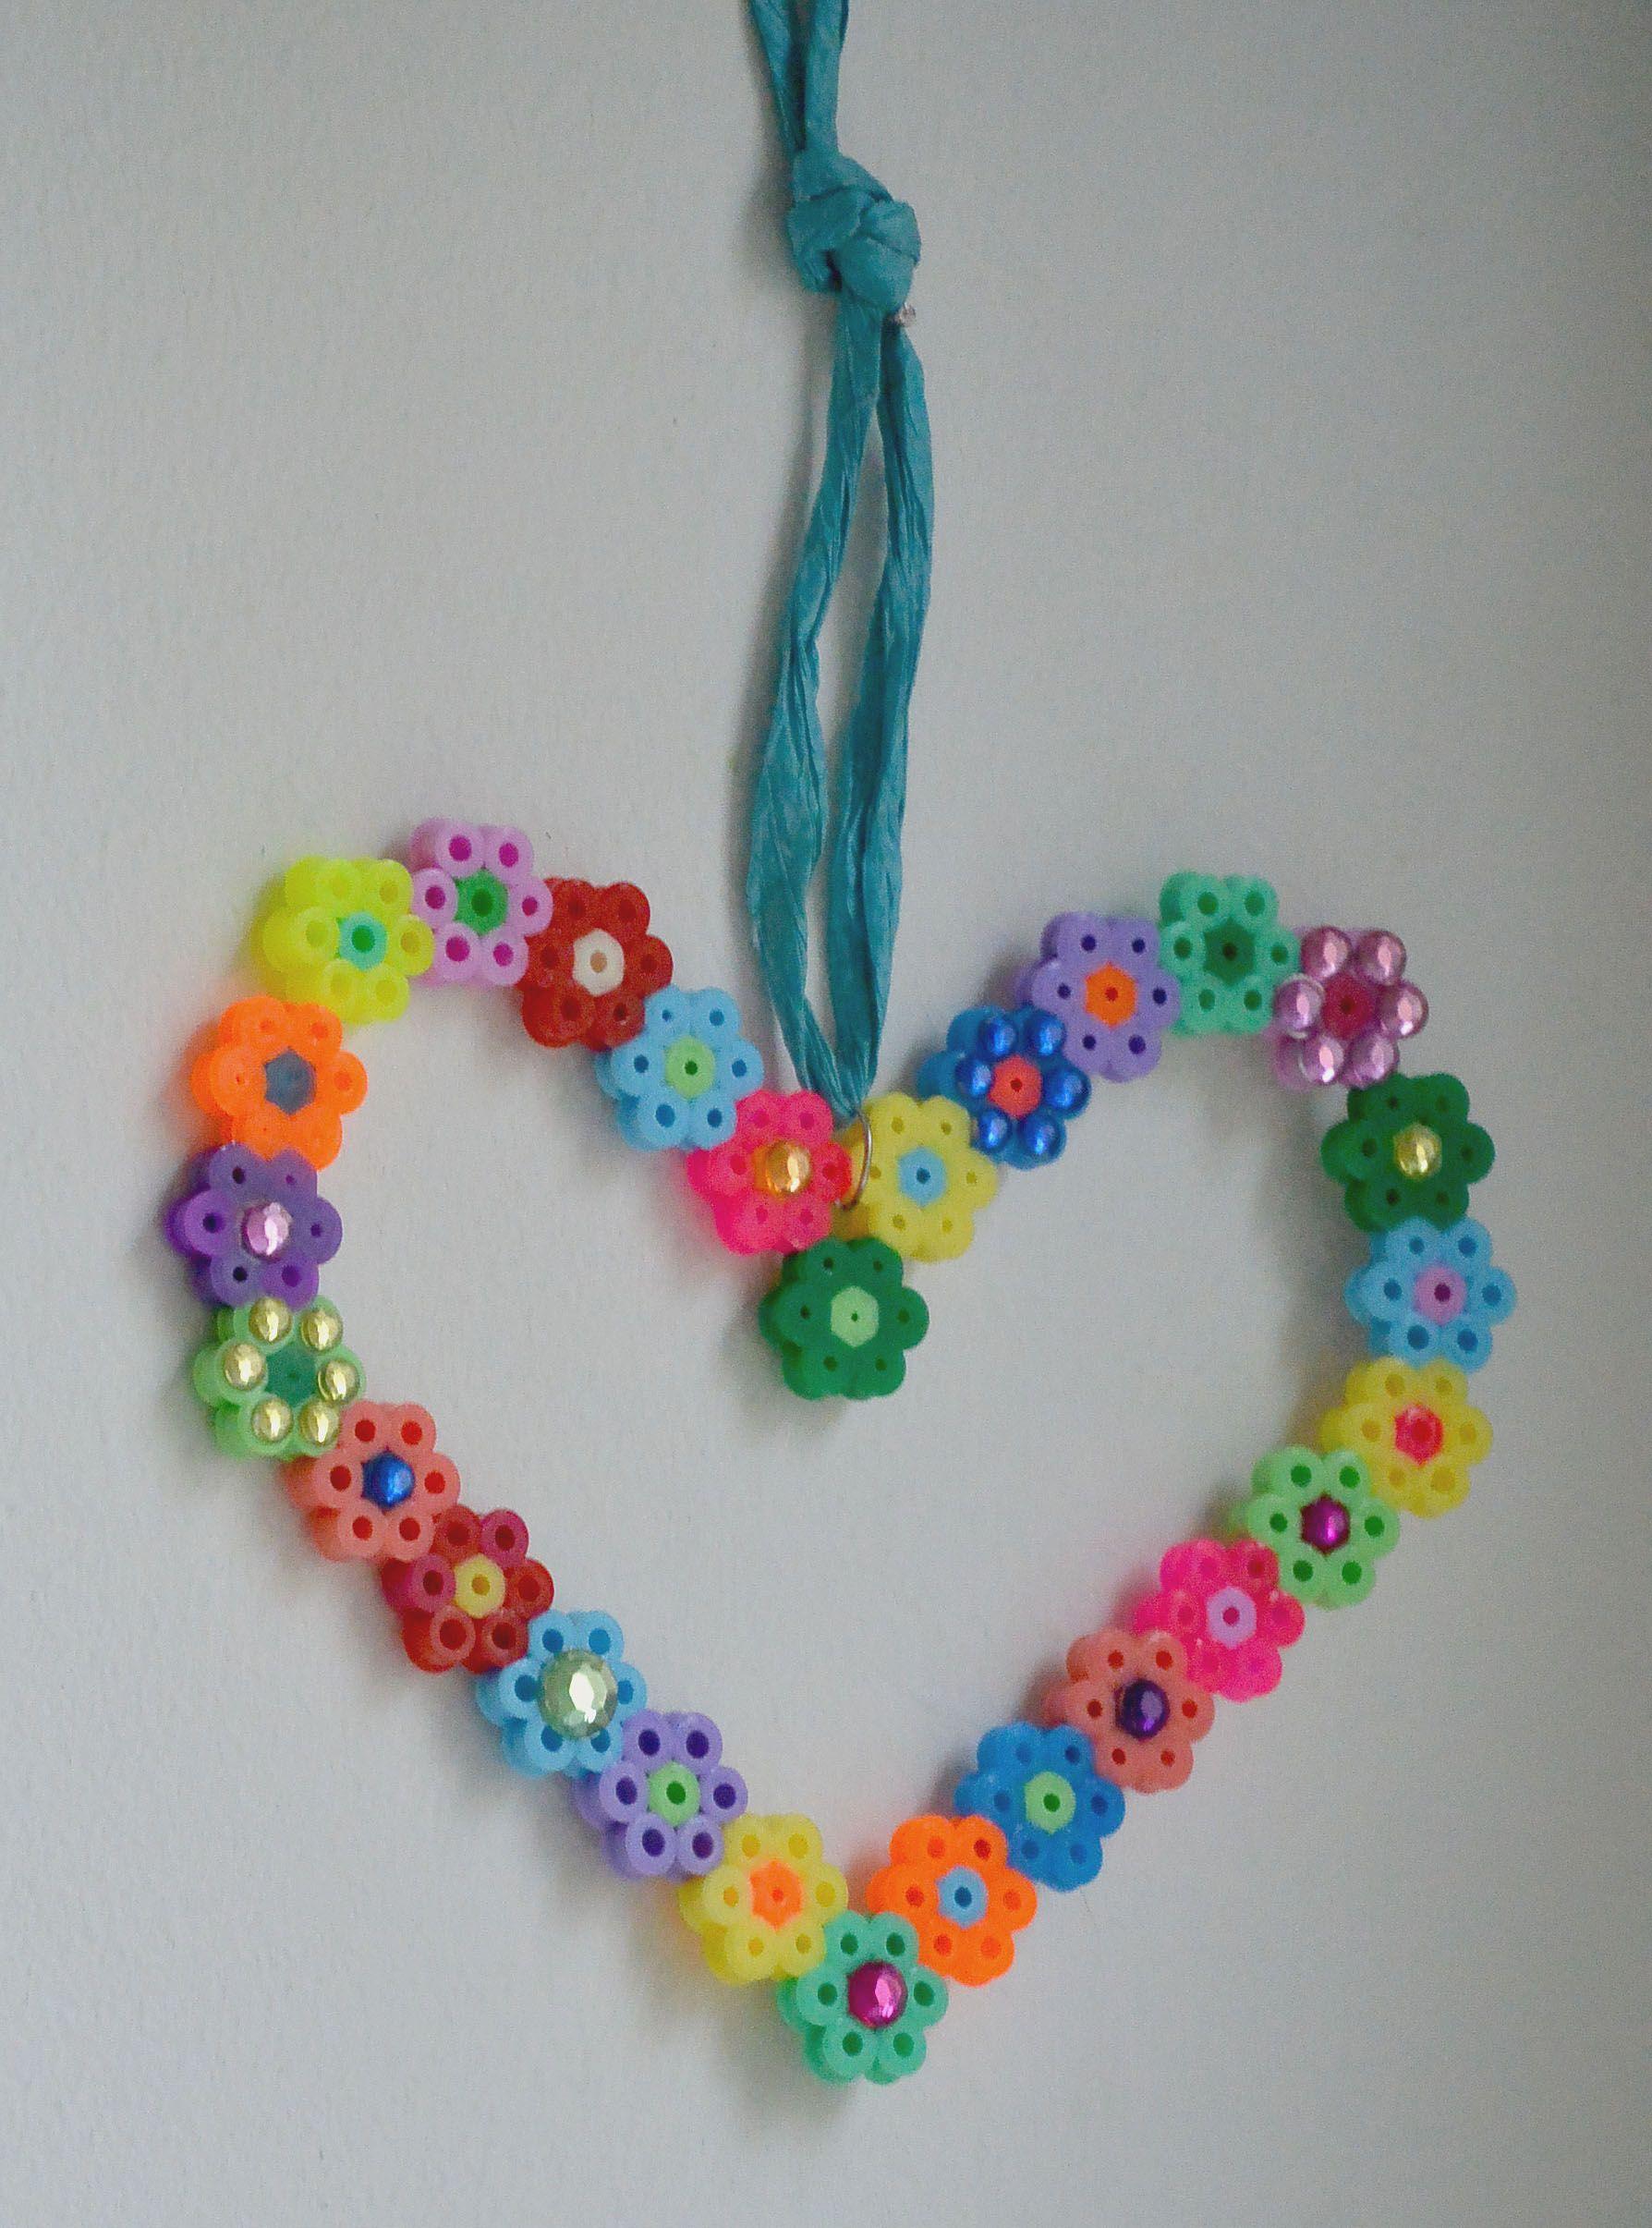 Hama Bgelperlen Herz  Bgelperlen  Hama beads design Hama Beads und Perler Beads